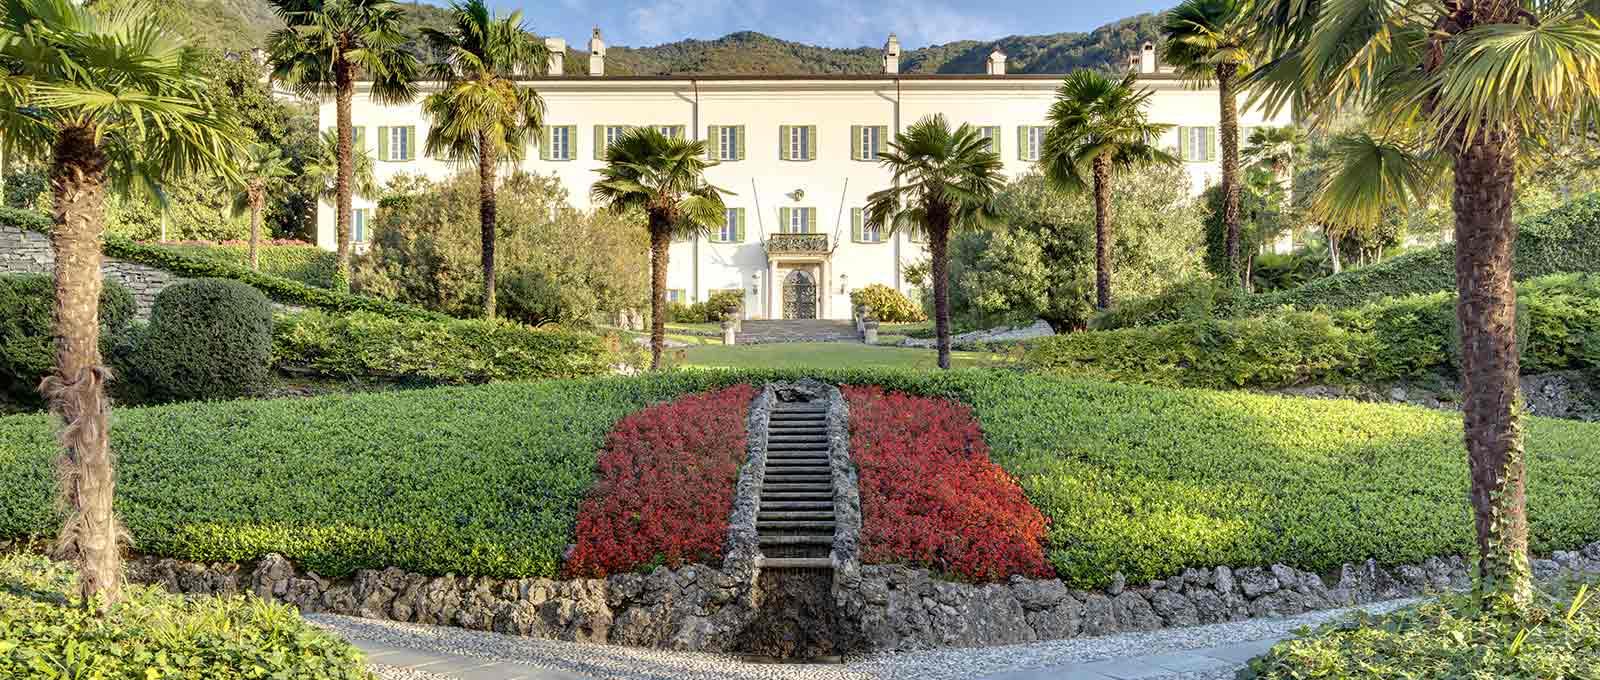 villa passalacqua como weddings 2